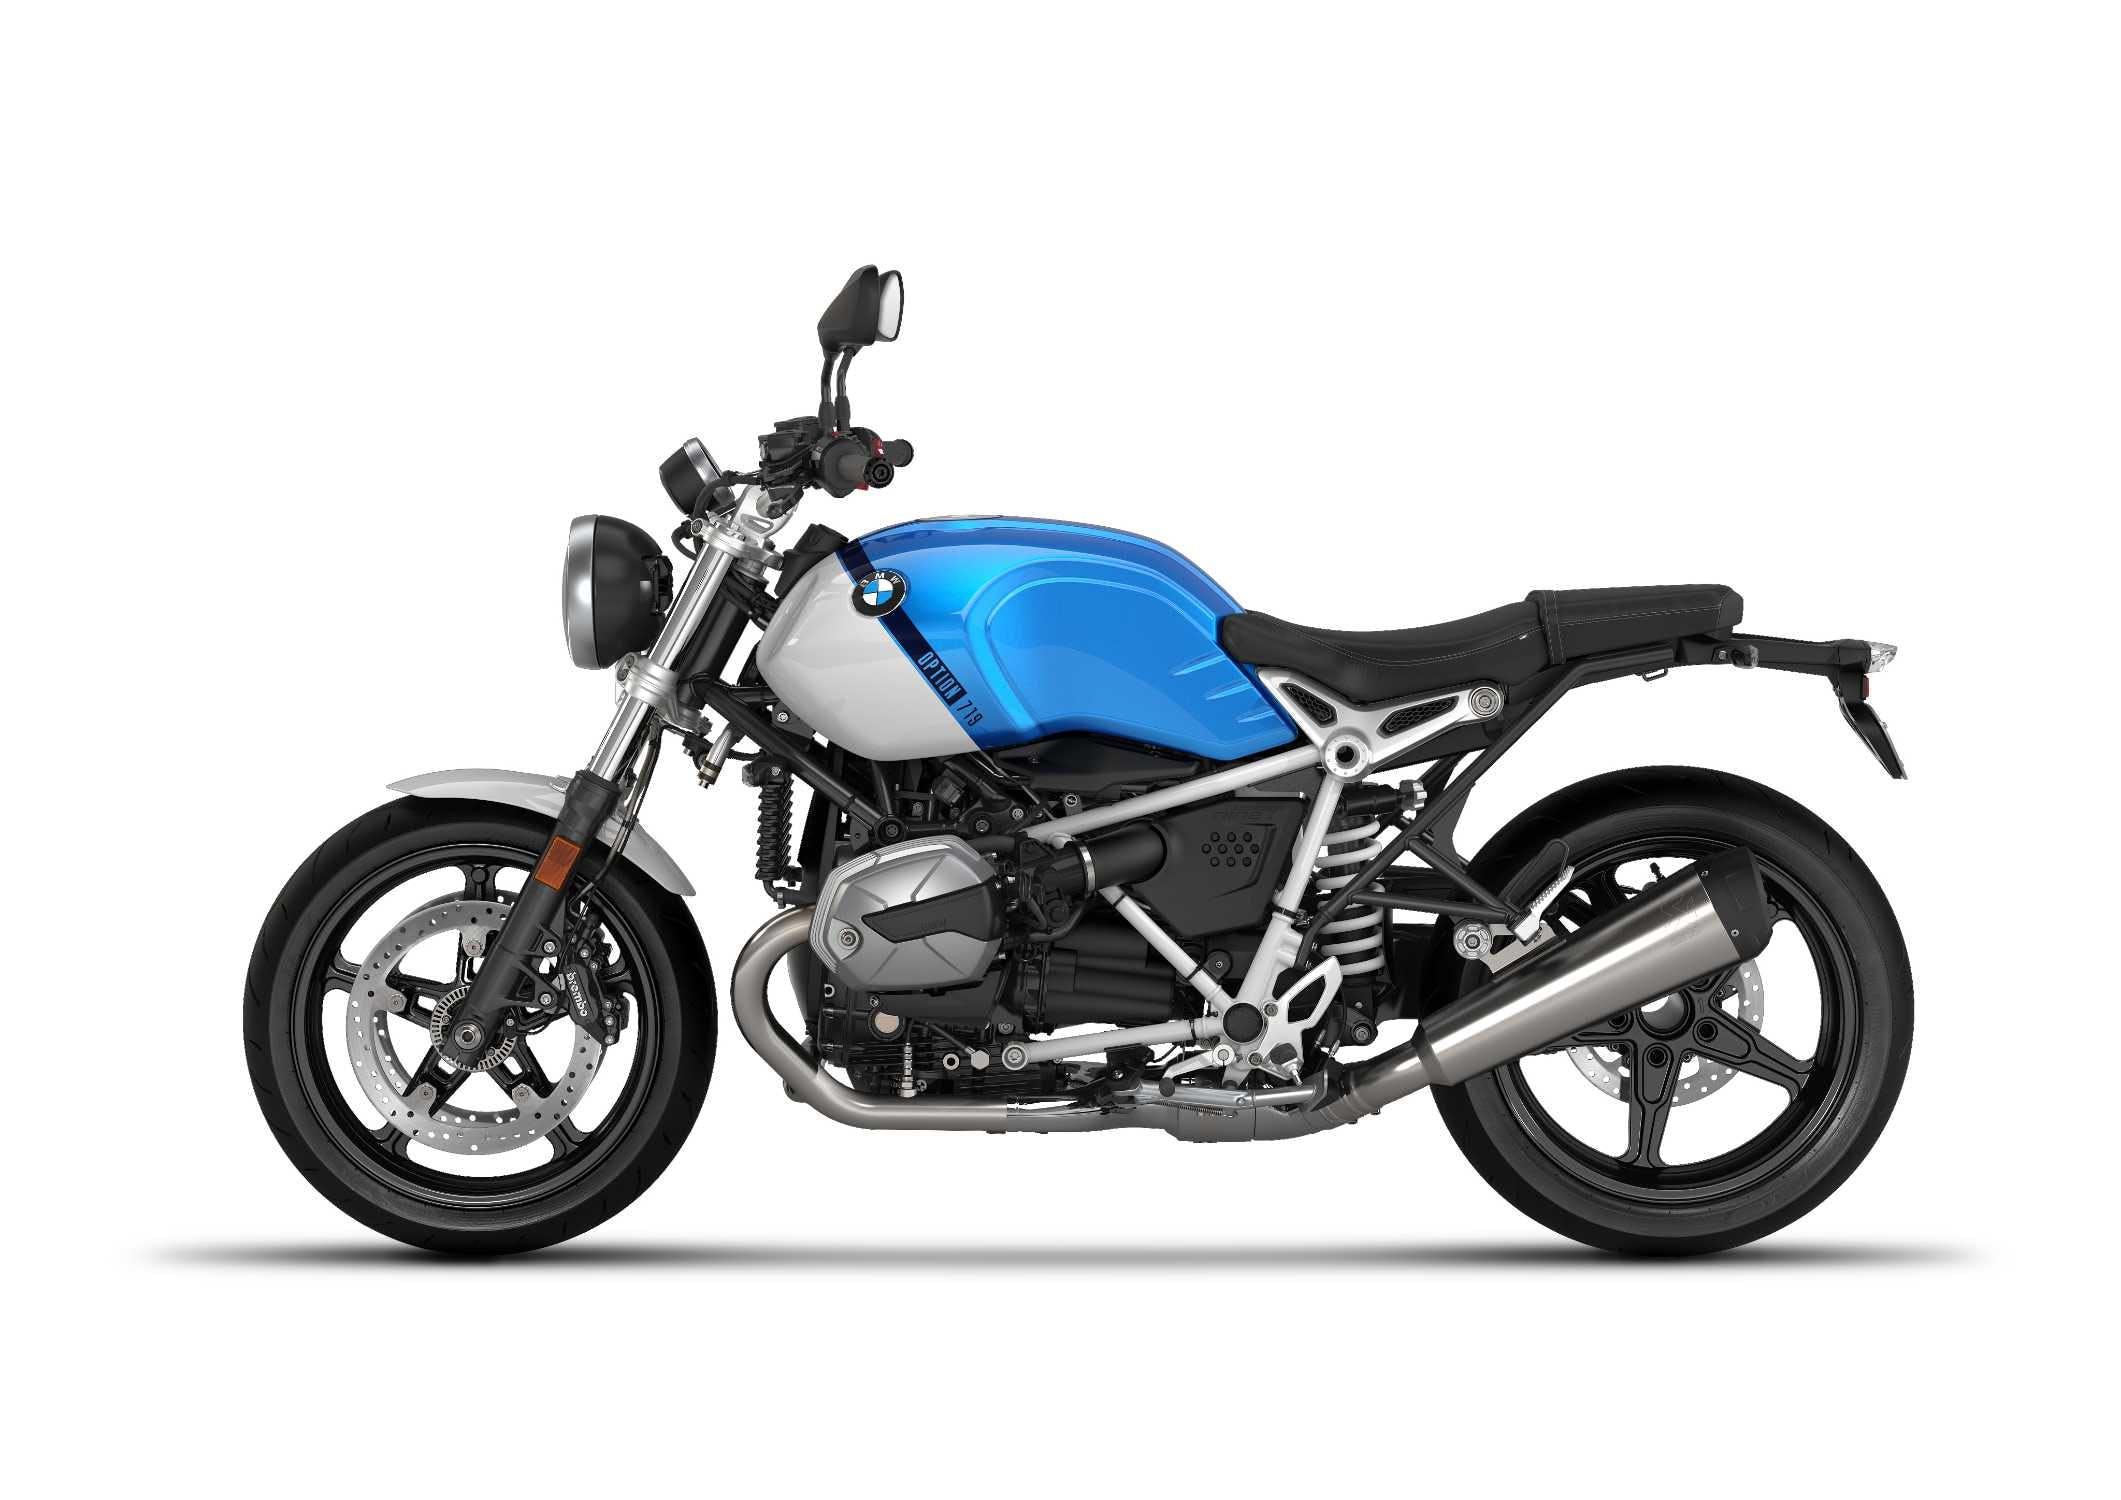 BMW R nineT Pure in Option 719 Cosmic Blue Metallic/Light White colour